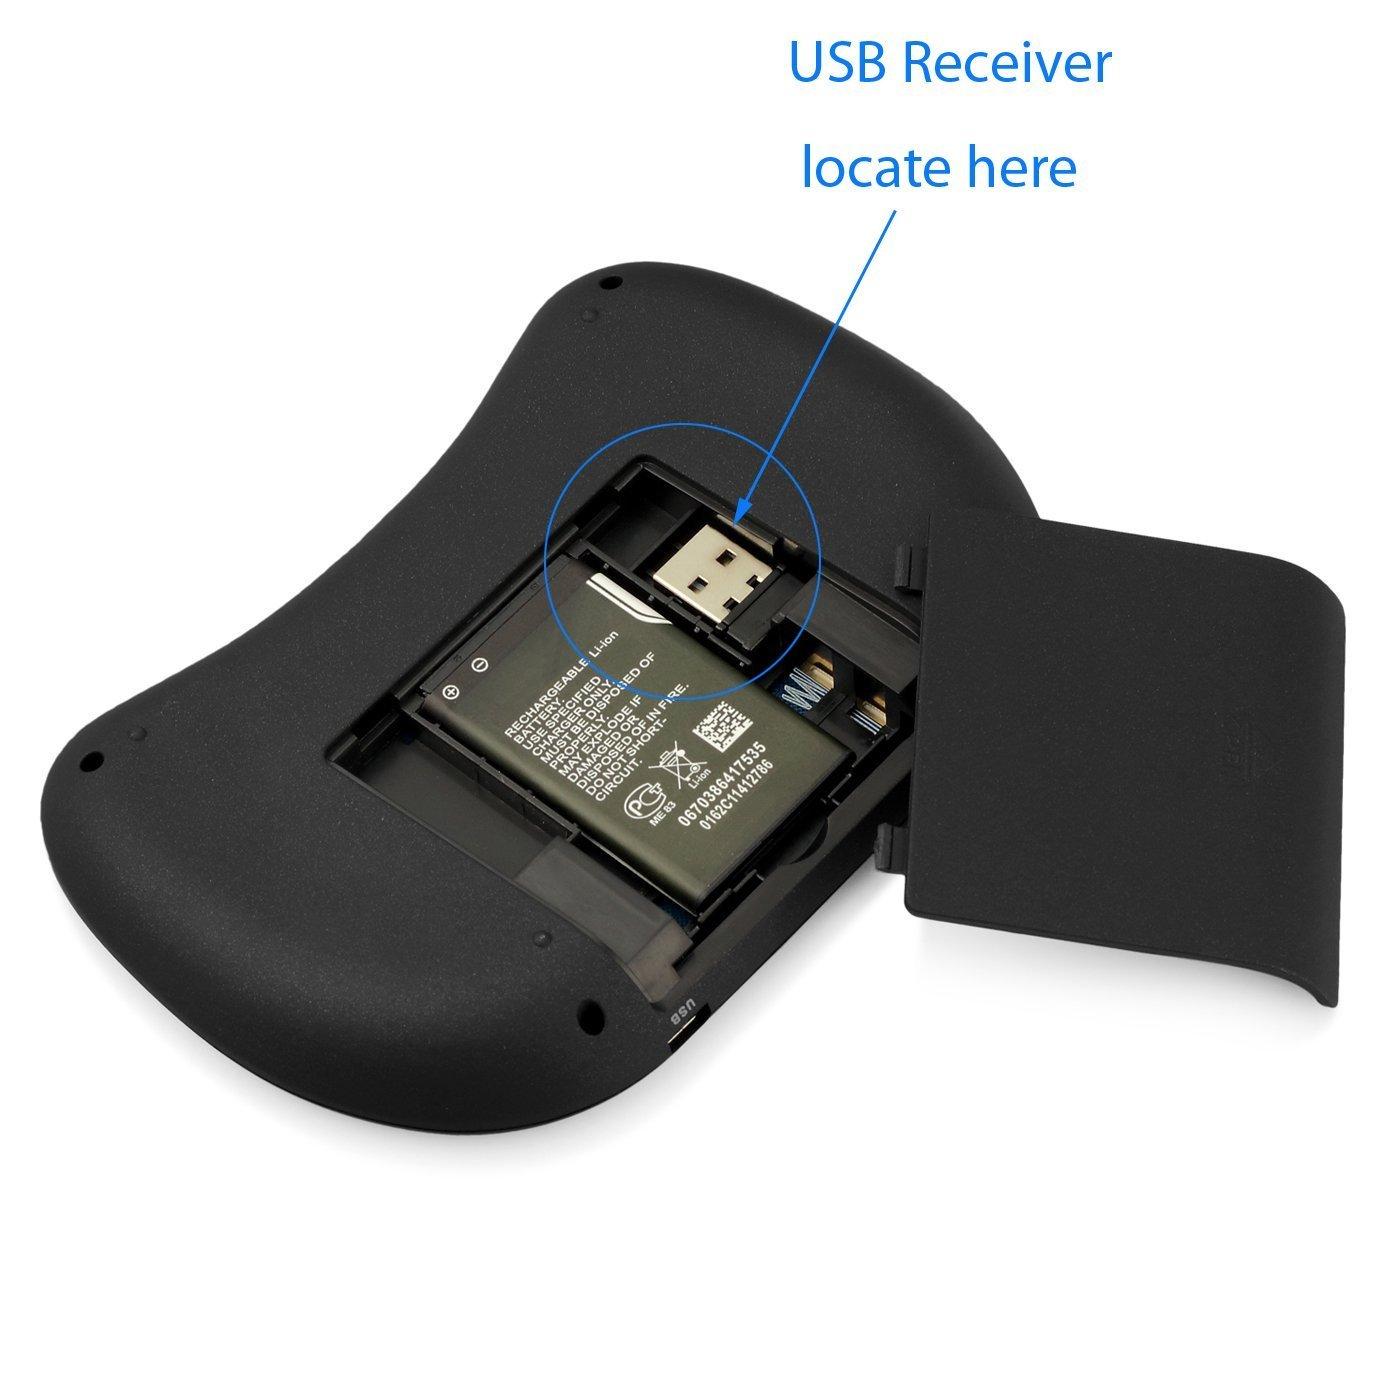 2.4 GHz Mini Wireless QWERTY Teclado con Touchpad Ratón móvil, Li-Ion Battery Para Philips 55pus6482/12 55pus6412/12 55pus6262/12 Smart TV: Amazon.es: Electrónica